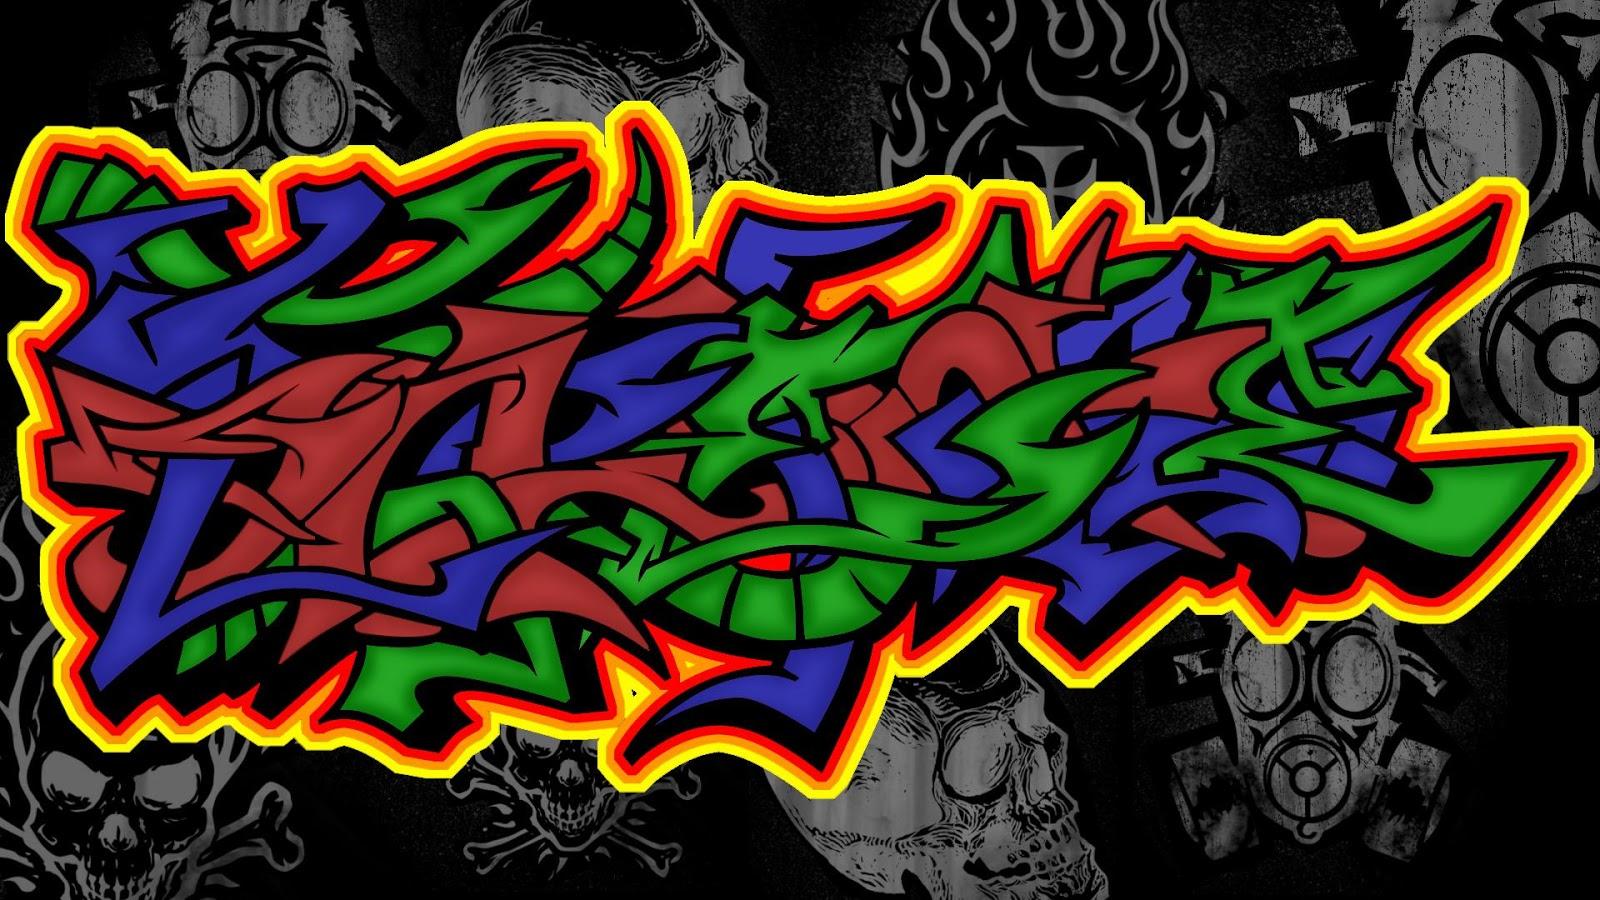 Graffiti creator online android -  Graffiti Live Wallpaper Art 1 02 Screenshot 3